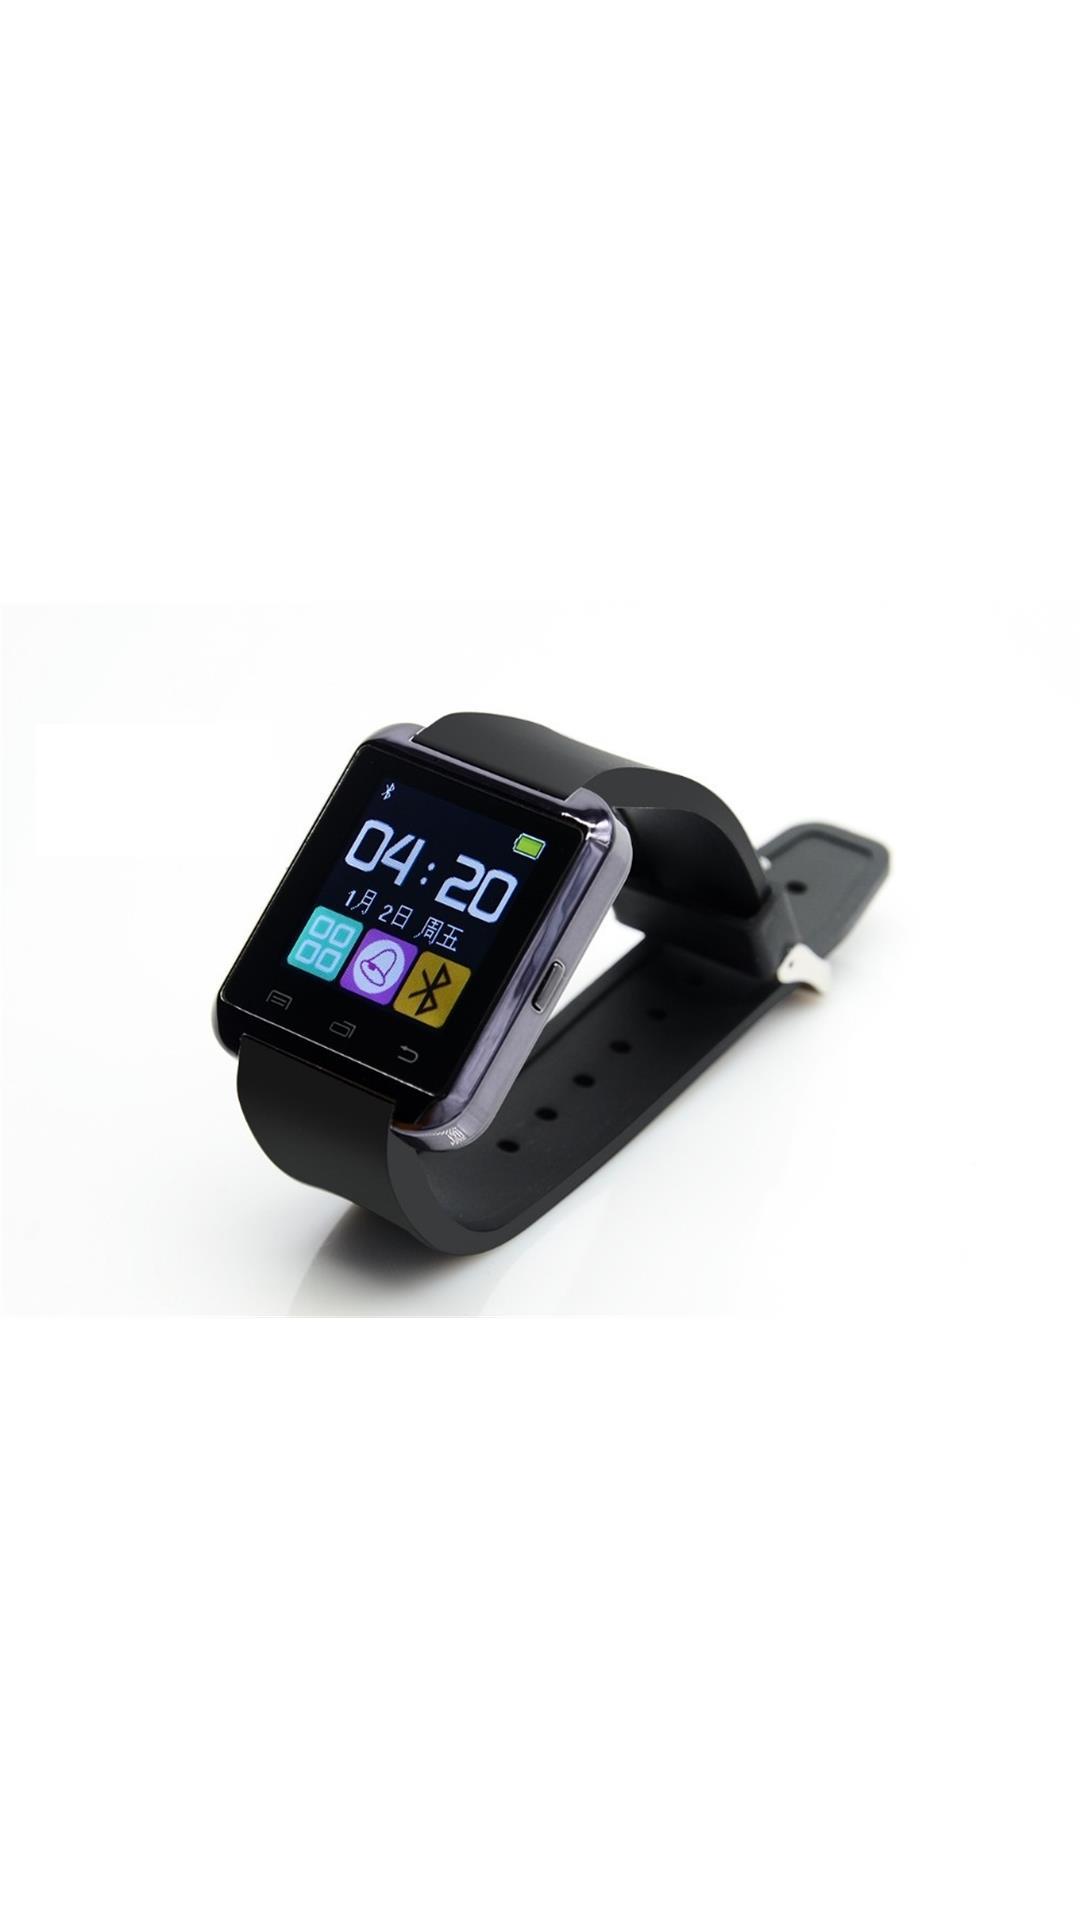 Bluetick Black U8 Smart watch with Free Laptop Keyboard LED Lights